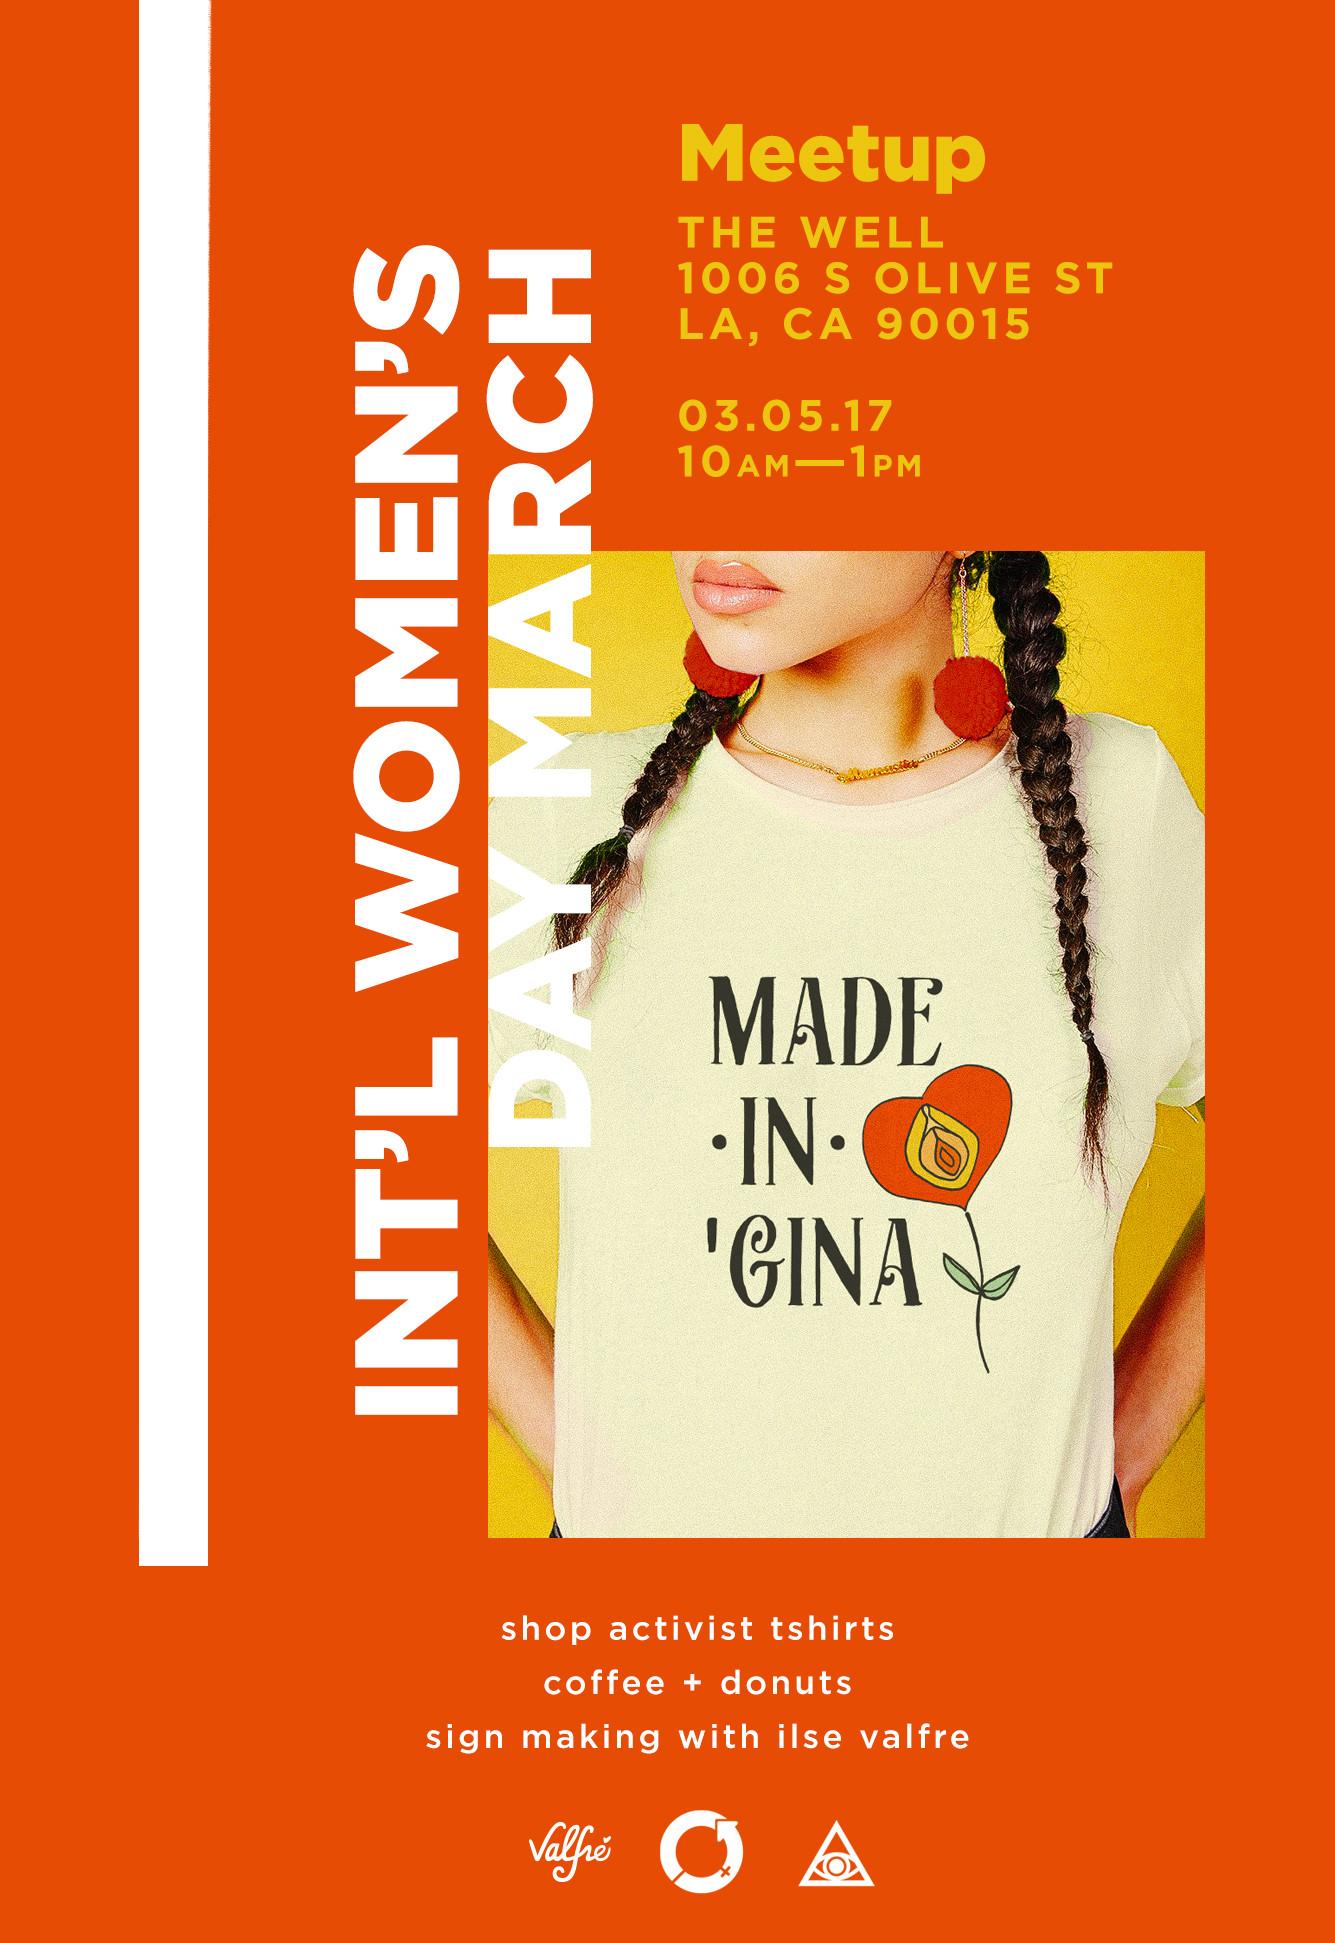 int-womens-day-meetup-event-blog-flyer_fa3c456e-1f7b-4595-9b06-6ad878ec88d6